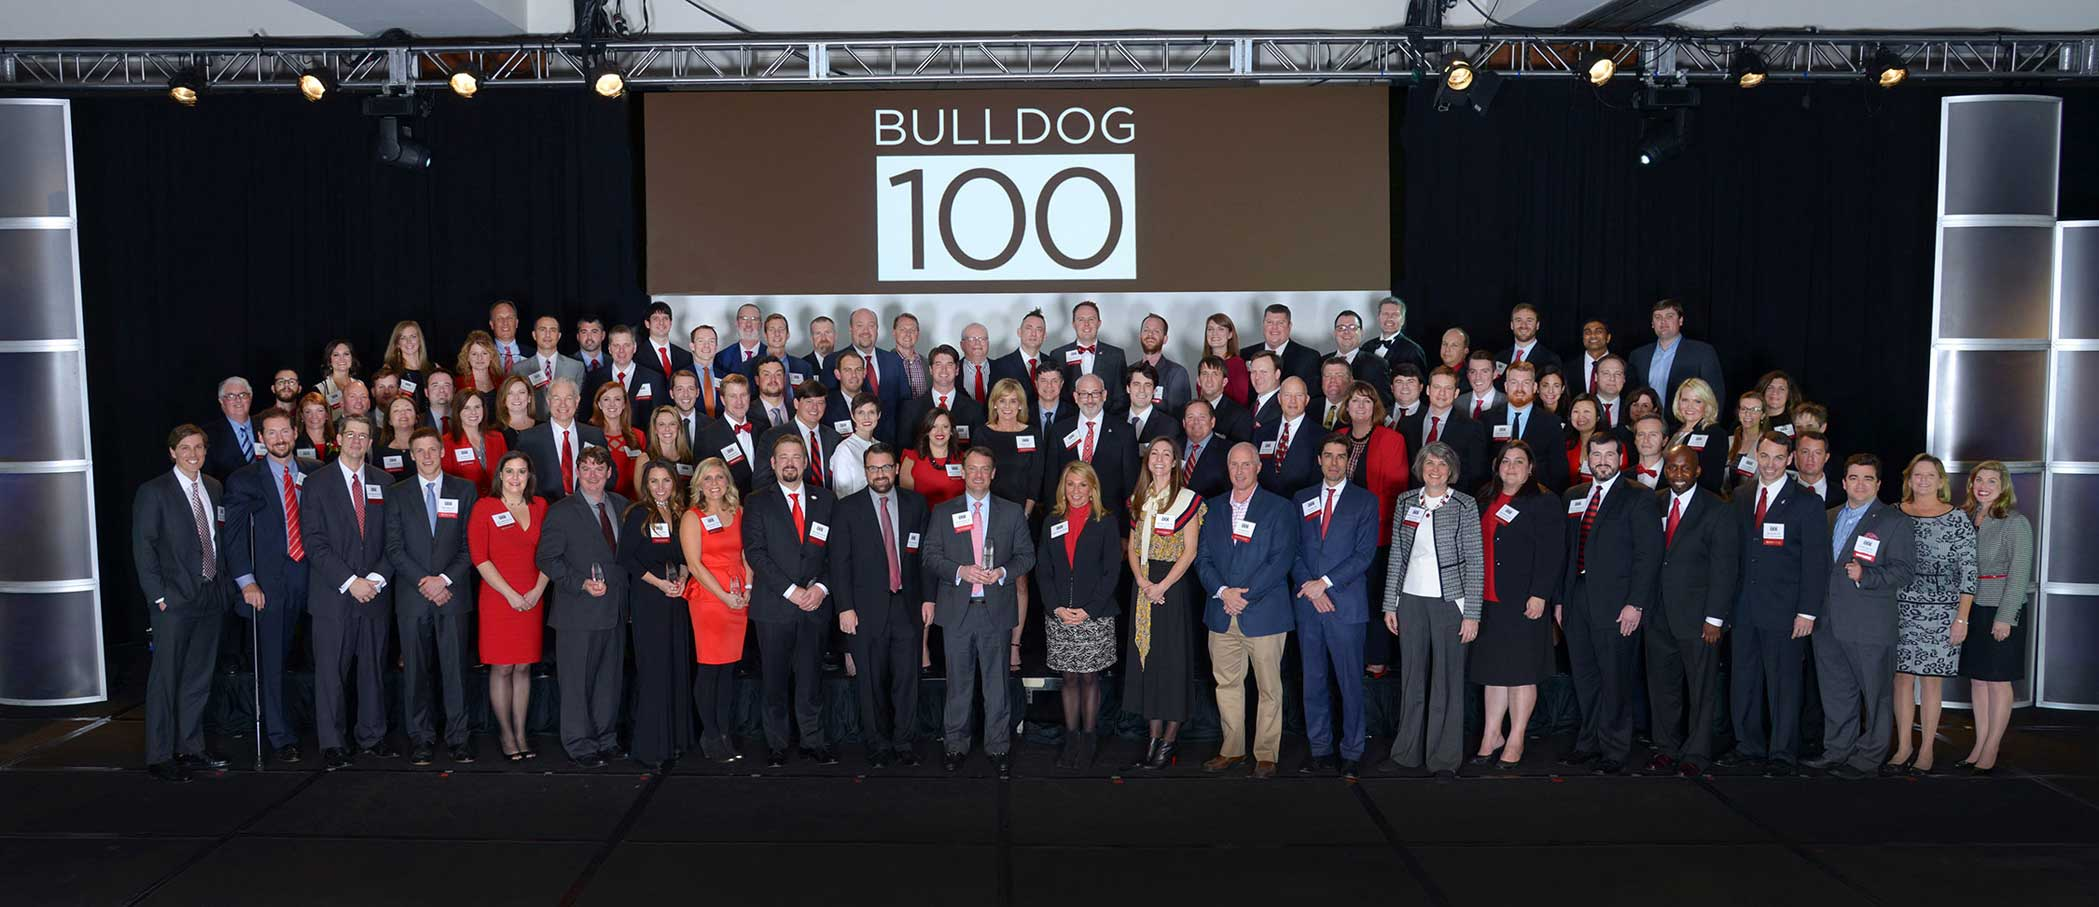 Bulldog 100 Honorees